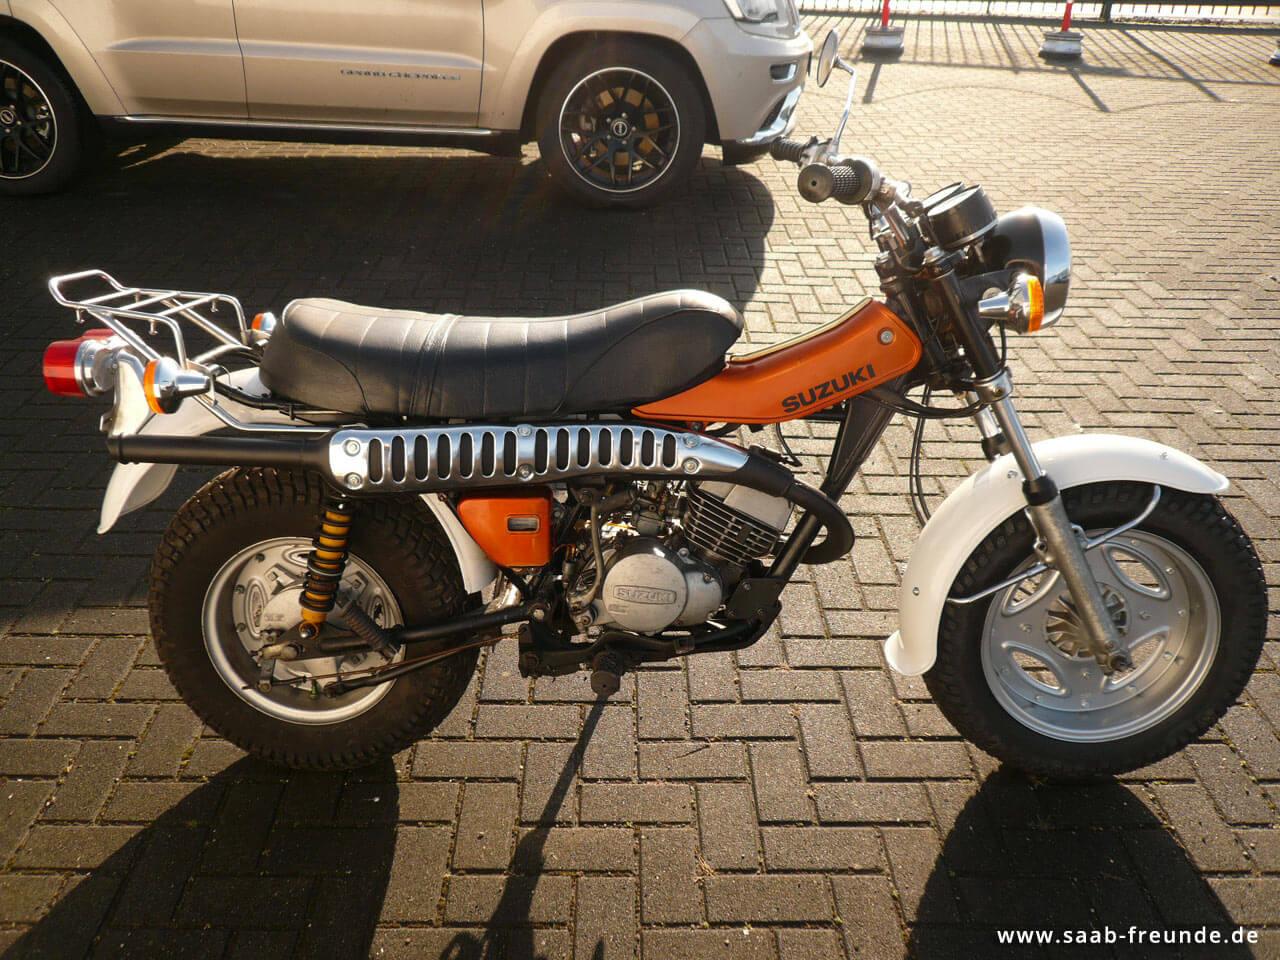 SUZUKI RV 125 Funbike (1)